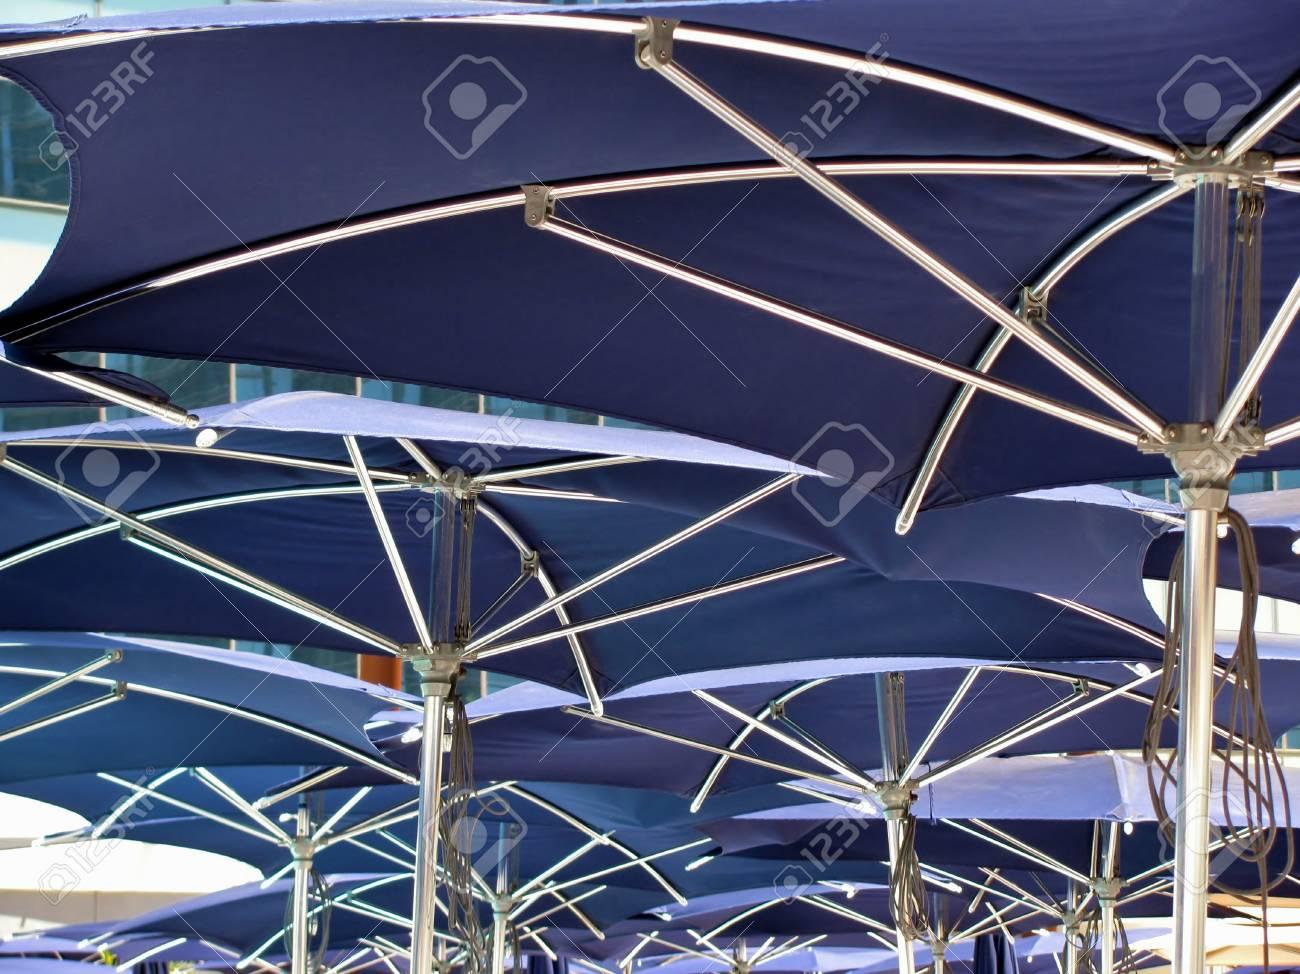 Under the blue swimming pool umbrellas